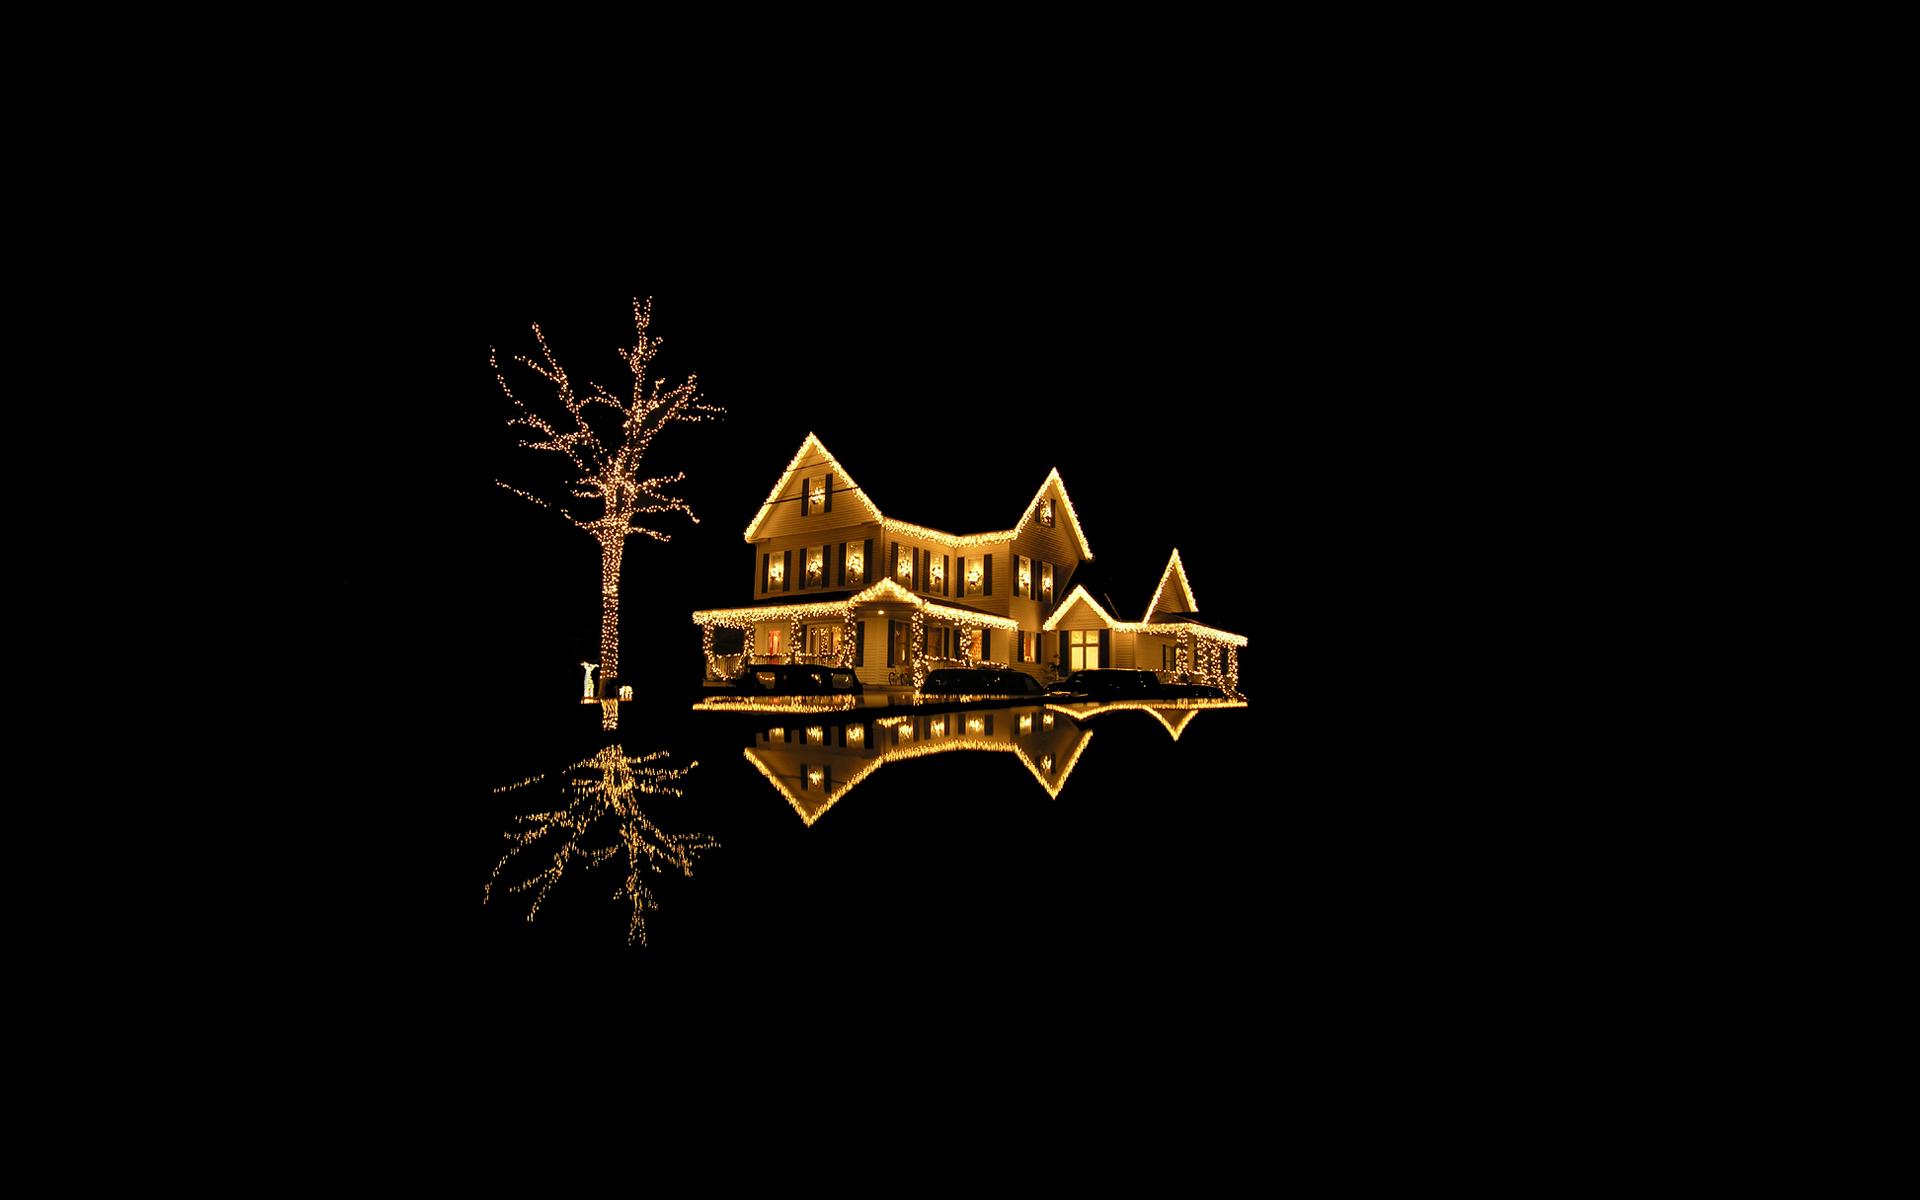 Fondo negro con casa con luces de navidad - 1920x1200